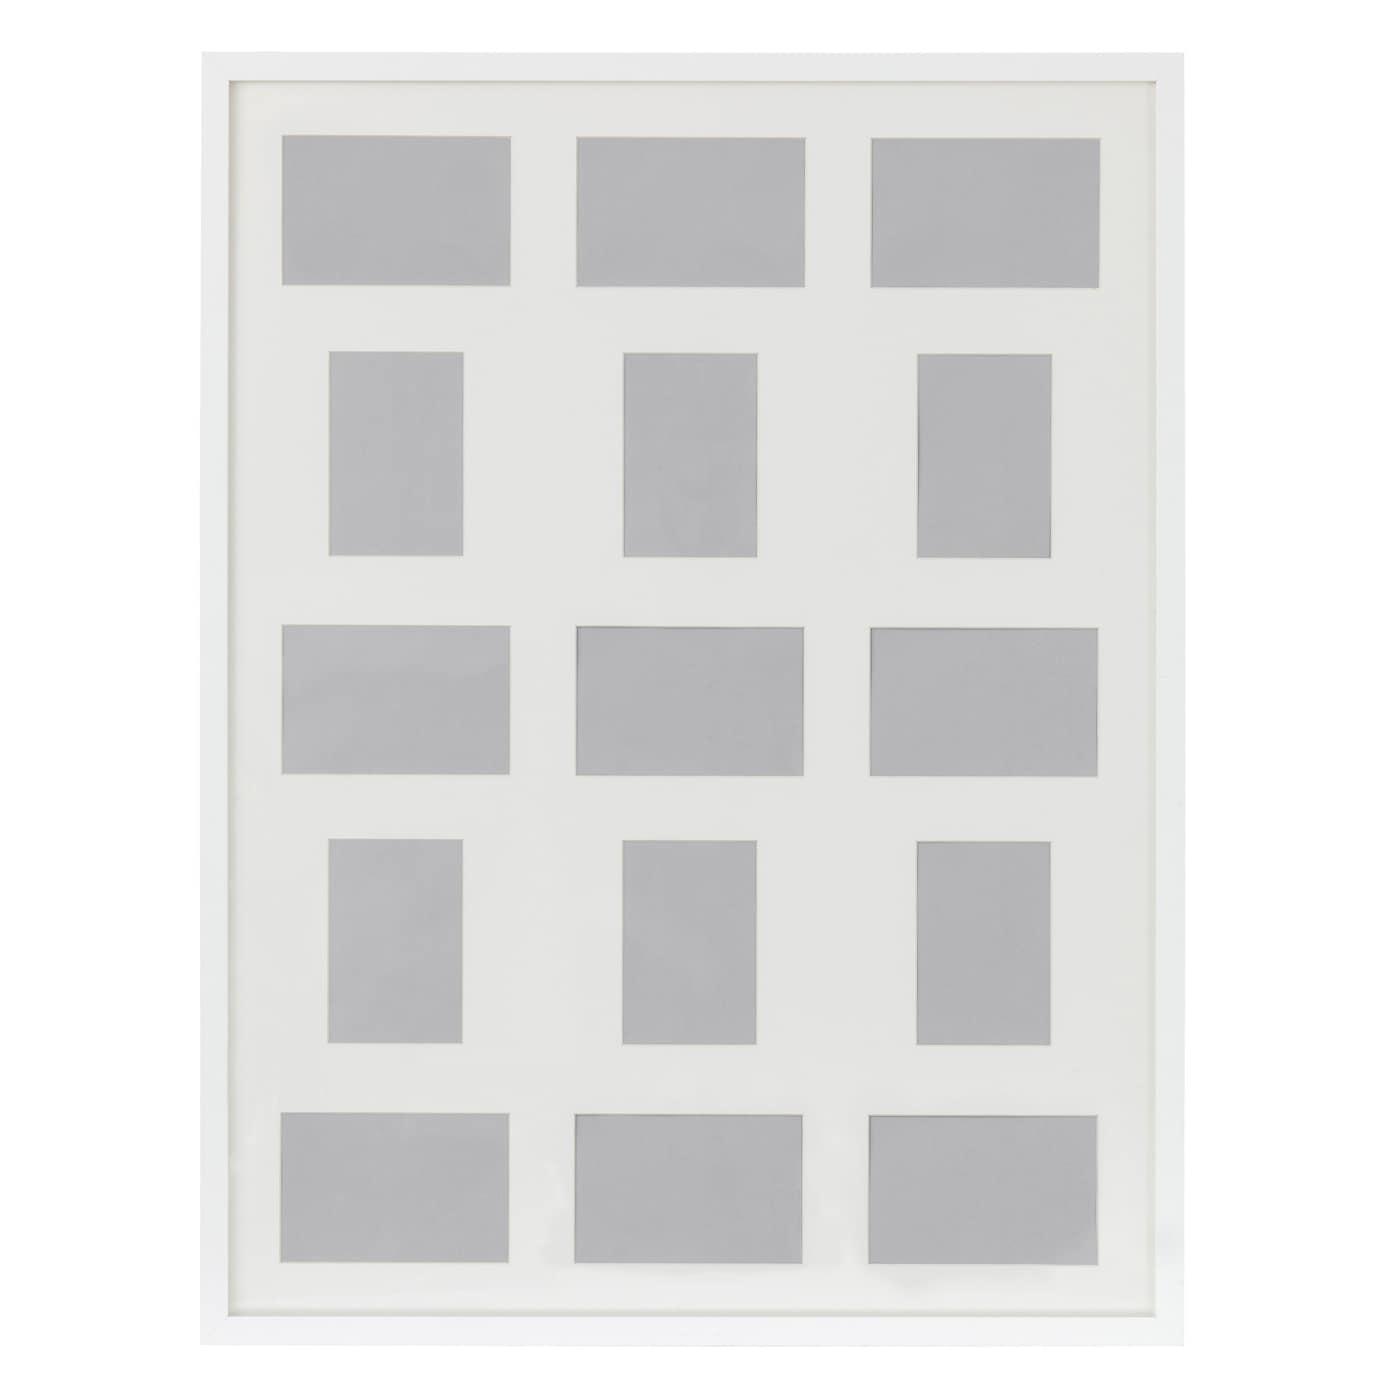 Ikea Bilderrahmen Collage växbo collage rahmen für 8 fotos ikea